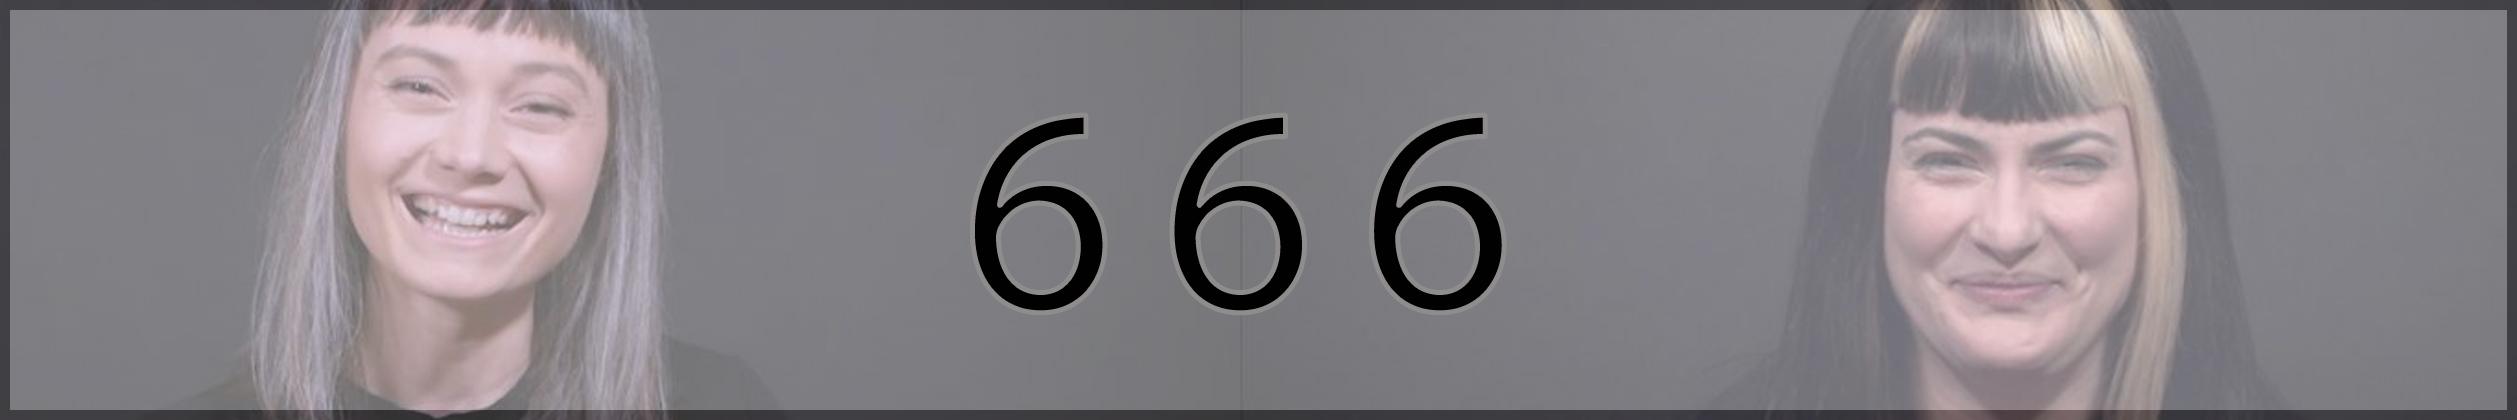 666_website_title